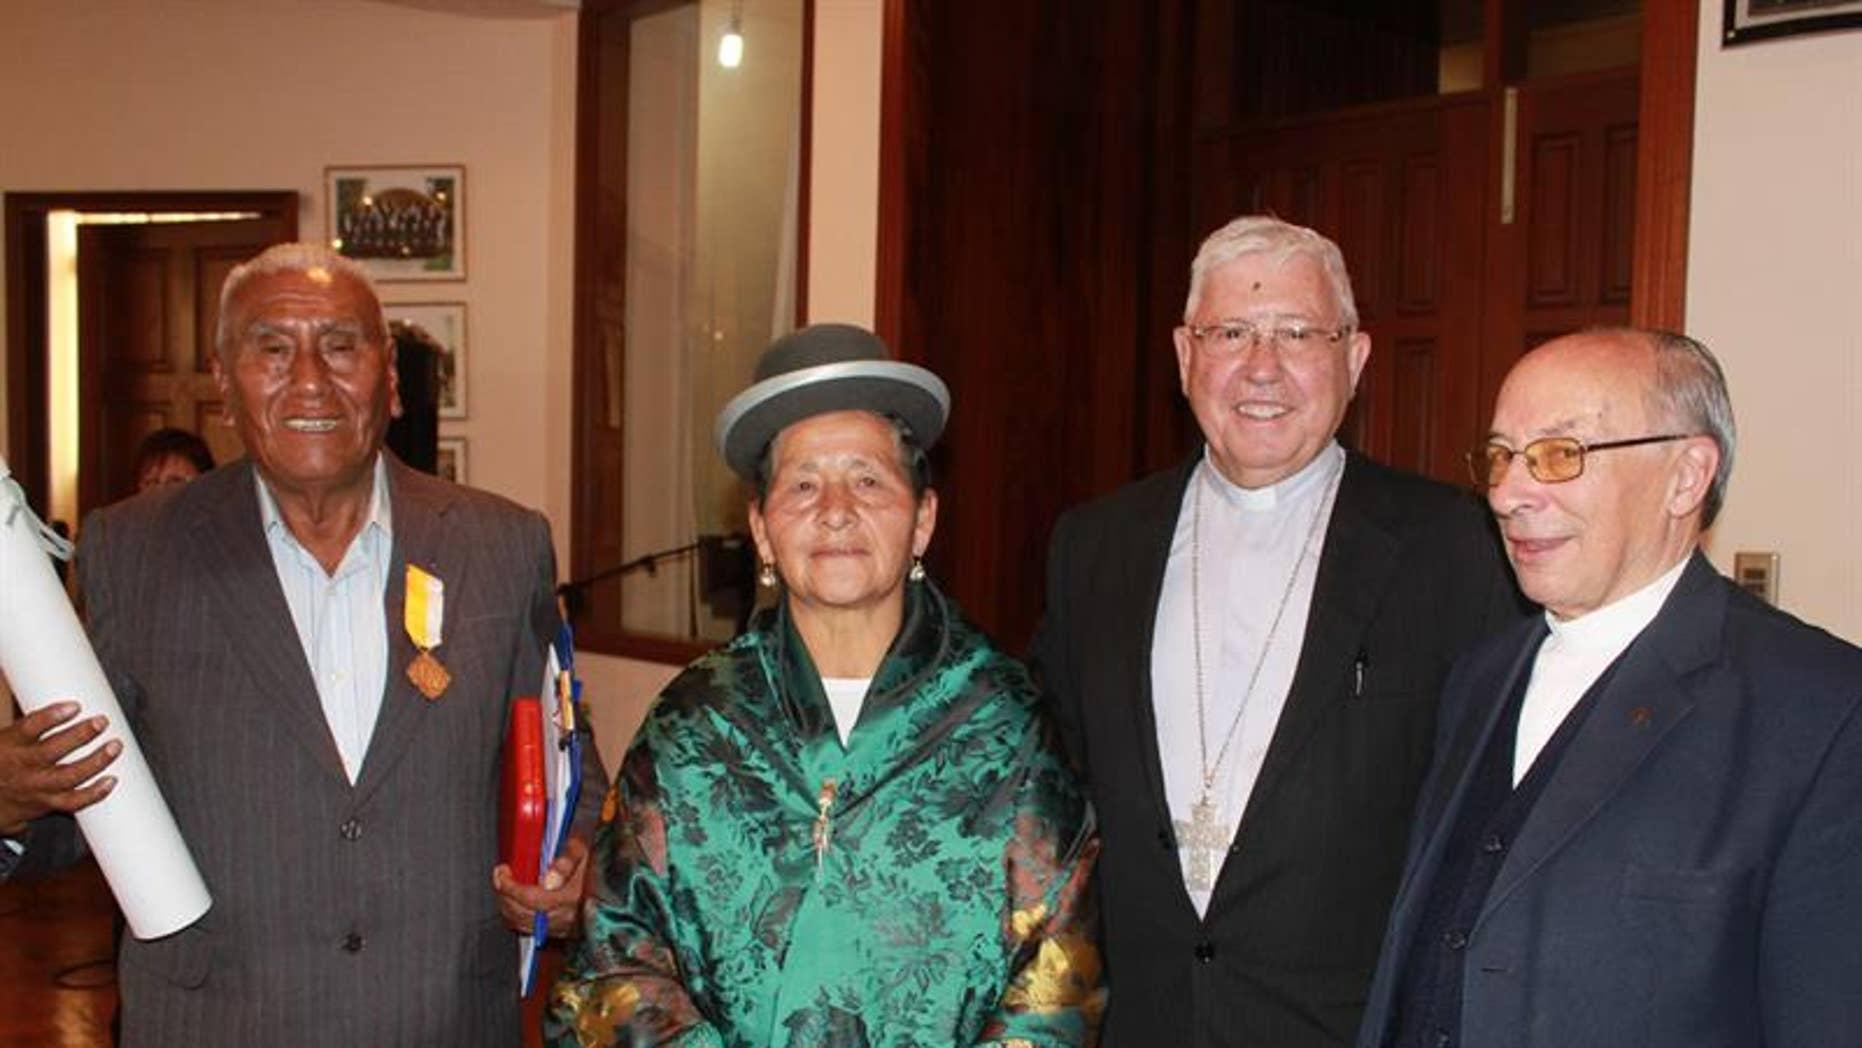 Spanish Jesuit Luis Palomera (R) and Sucre Department Arzbishop Jesus Juarez pose with Vicente Quispe Chura and his wife Francisca Carlo de Quispe.